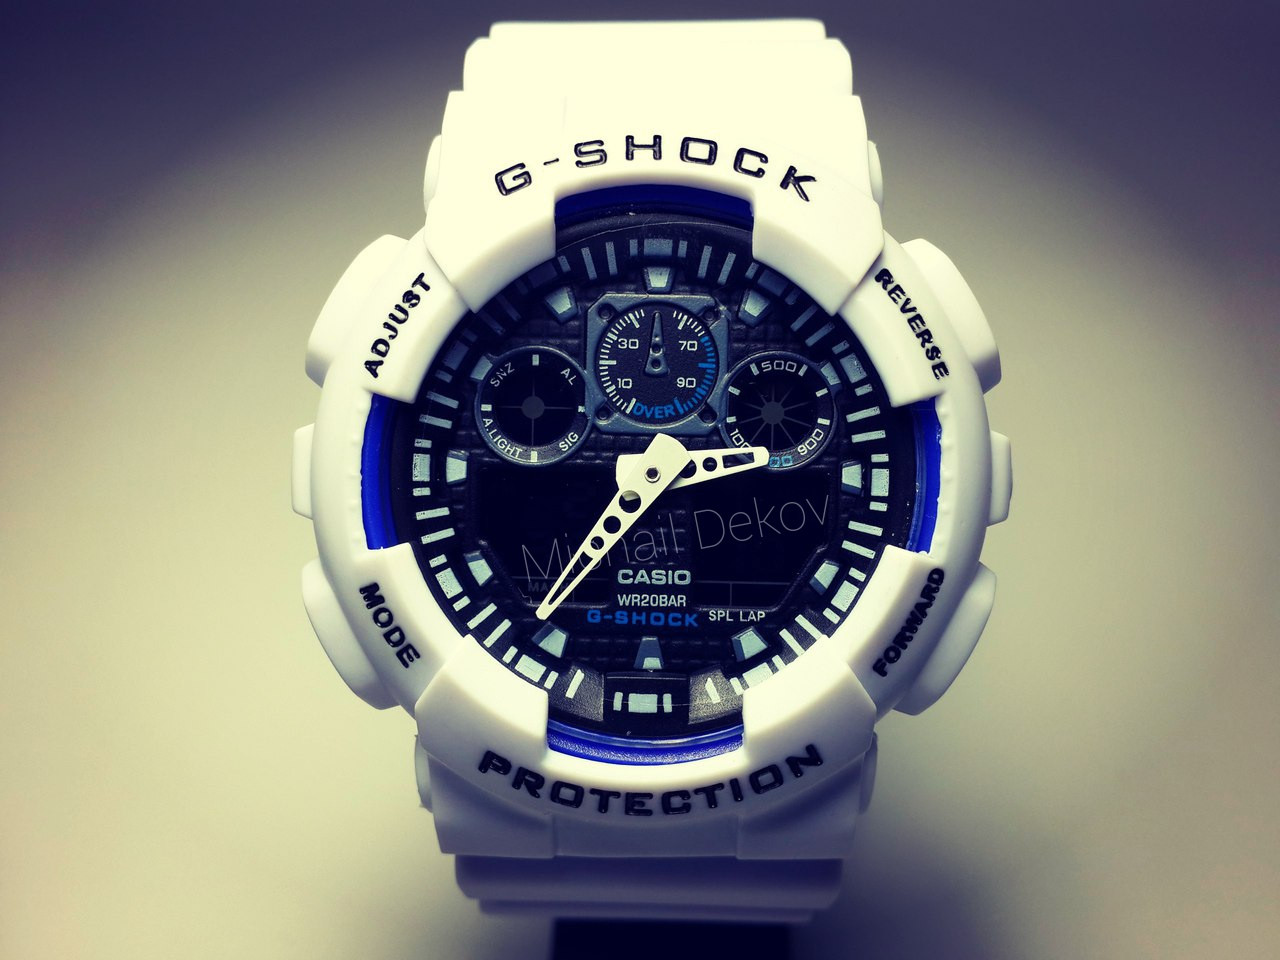 ЧАСЫ CASIO G-SHOCK GA-100   White Black Dial -реплика